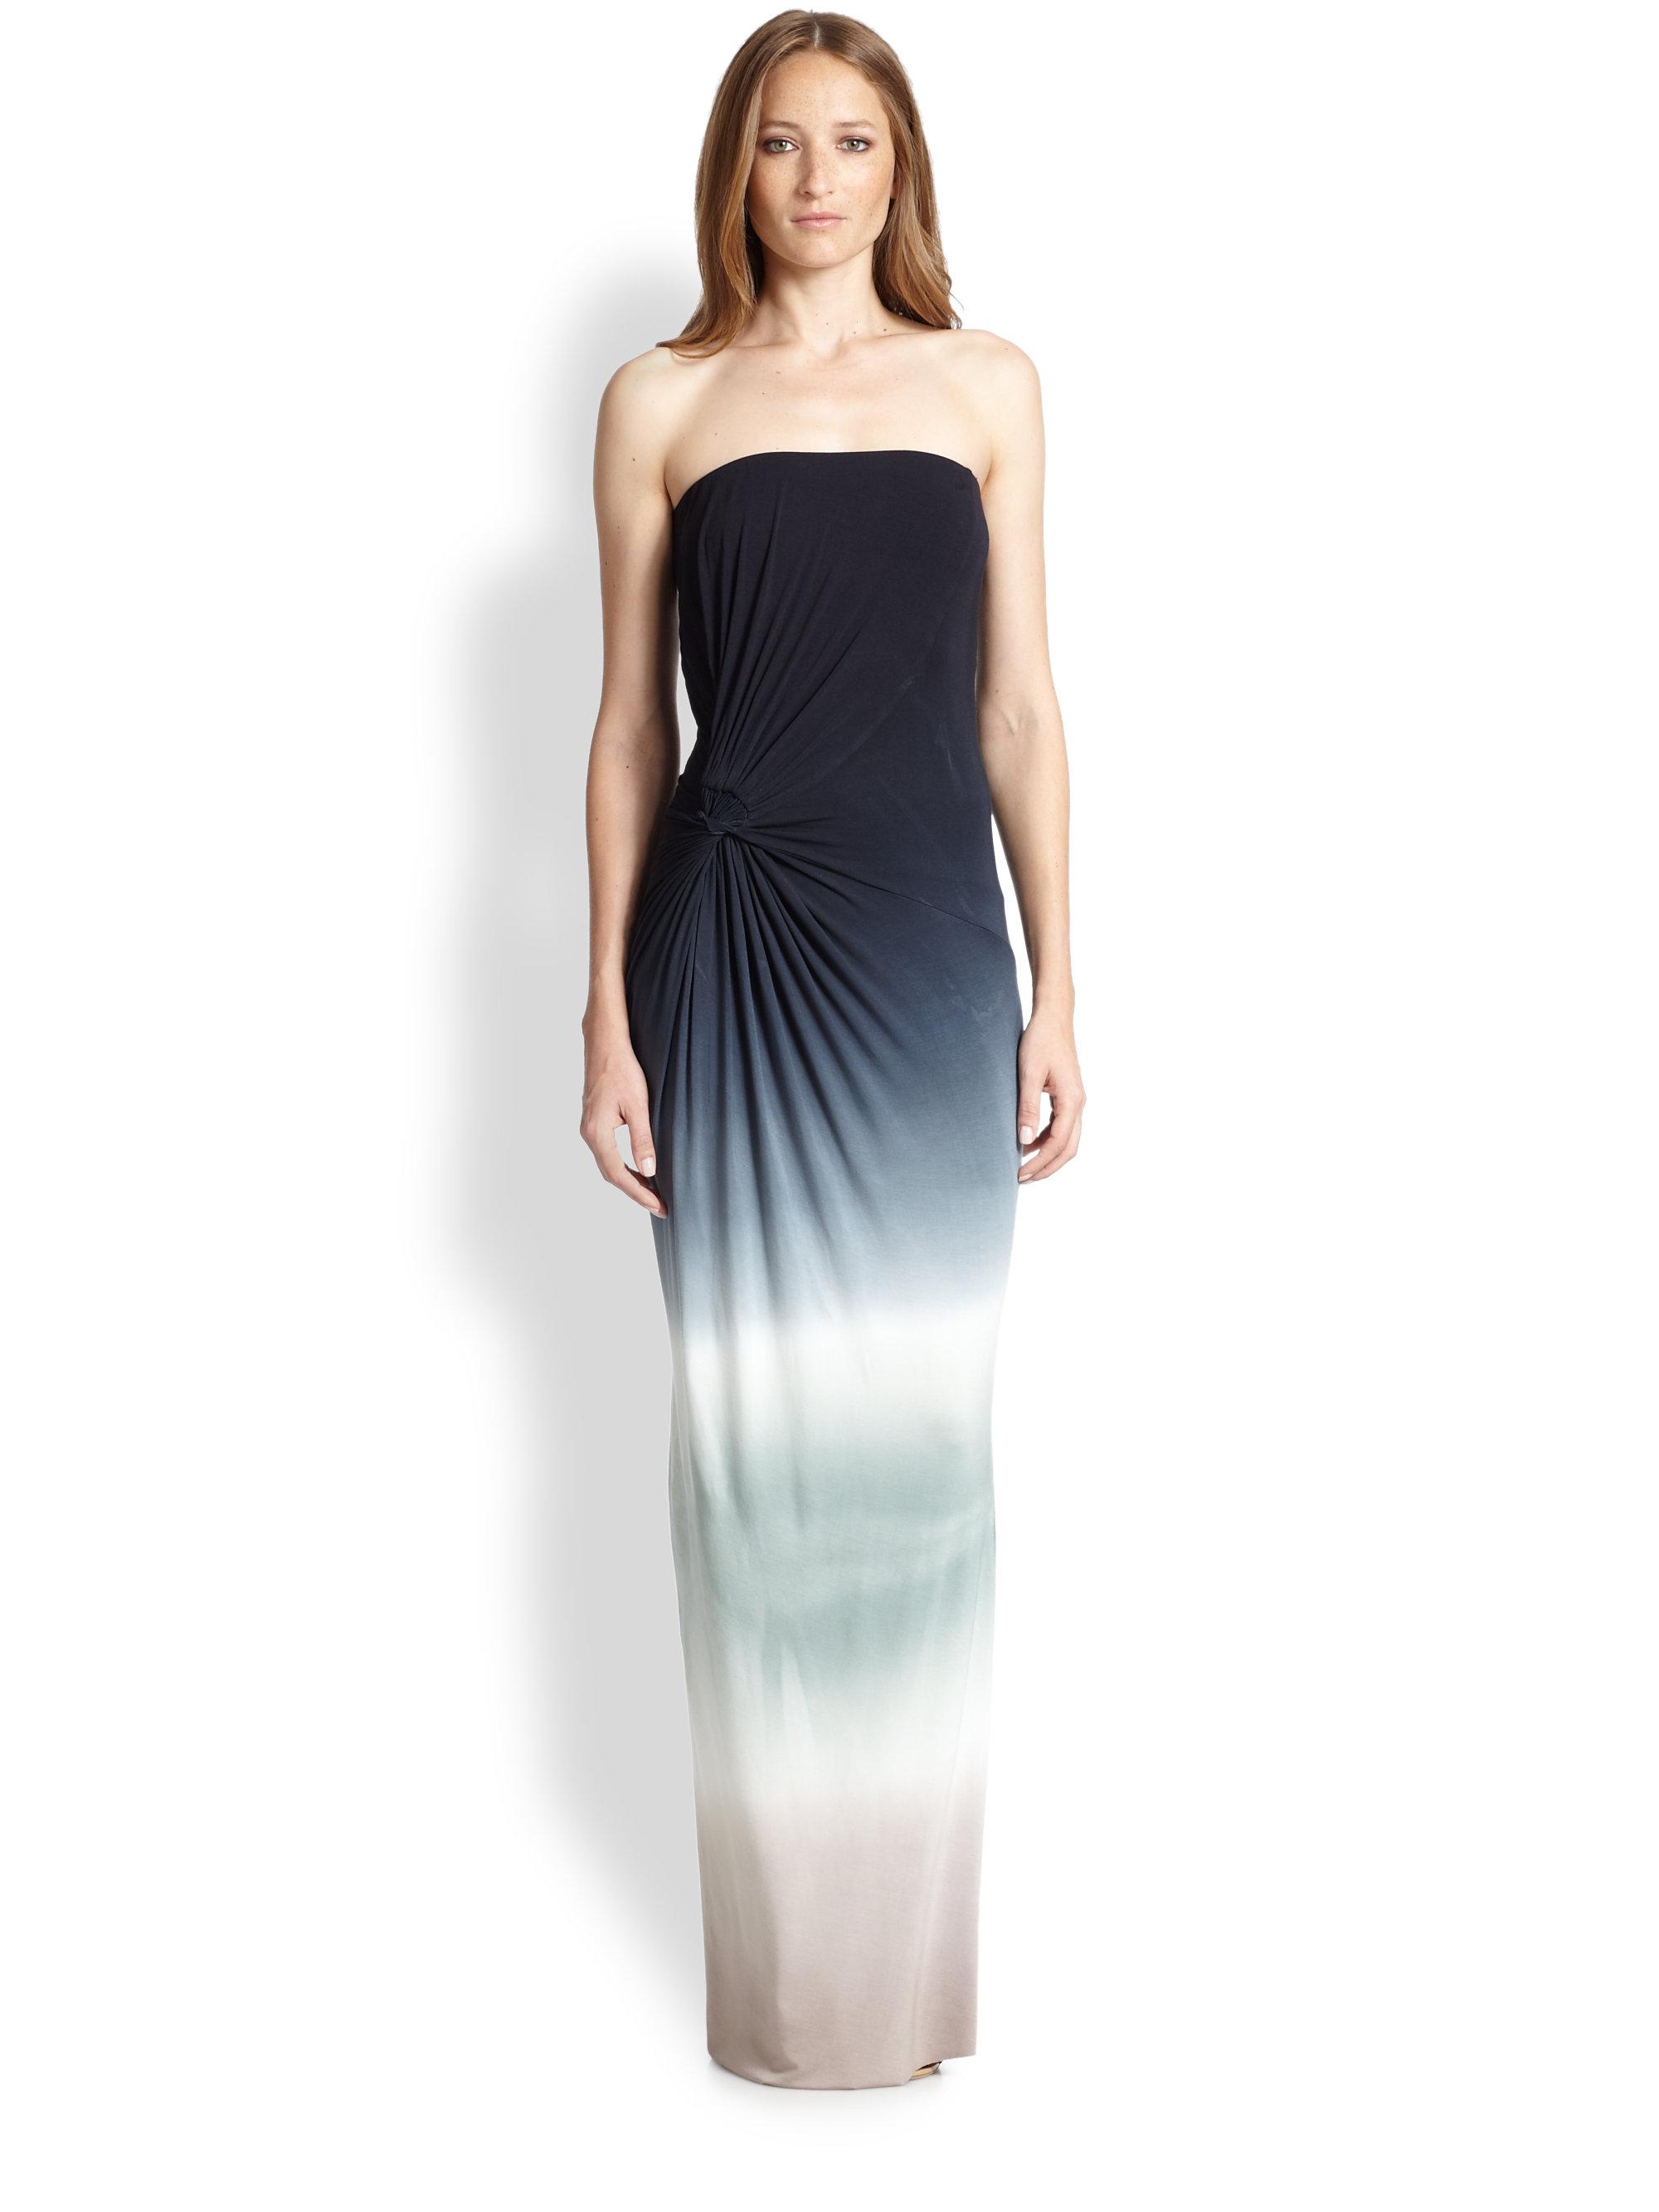 Lyst Young Fabulous Amp Broke Chandra Ombr 201 Maxi Dress